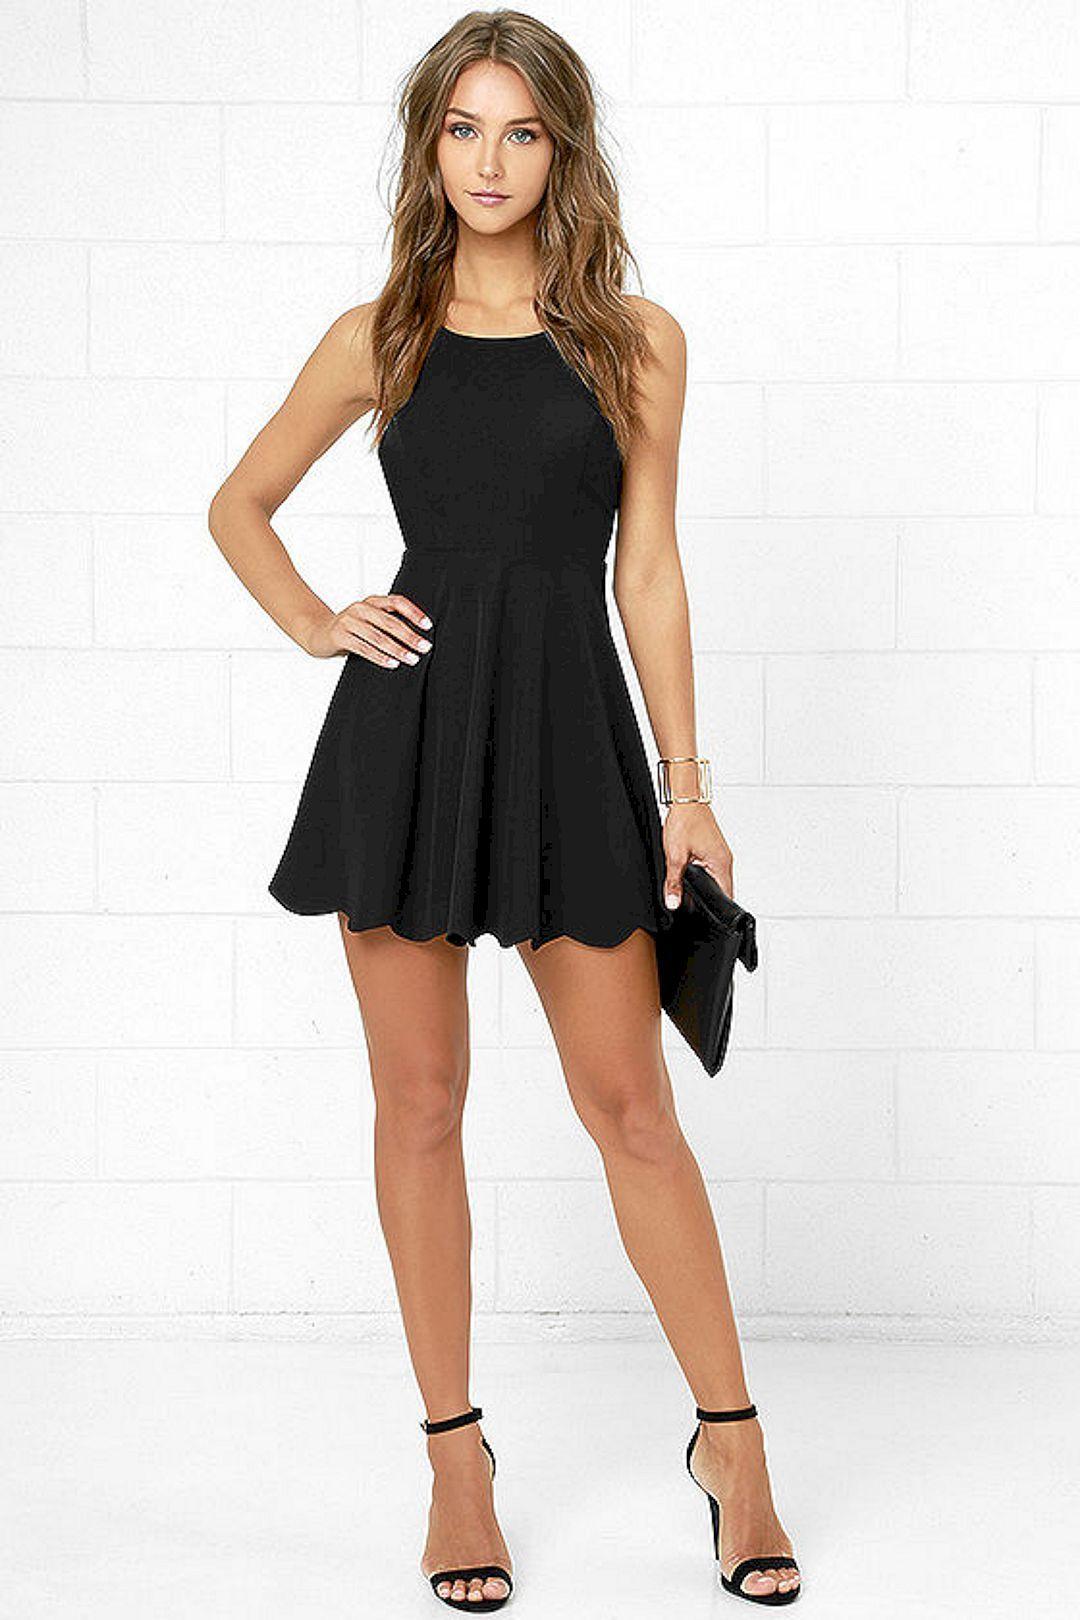 Stunning Top 30 Gorgeous Women S Little Black Dress Http Uniqlog Com Top 30 Gorgeous Womens Little Black Dres Black Backless Dress Black Dress Short Dresses [ 1620 x 1080 Pixel ]